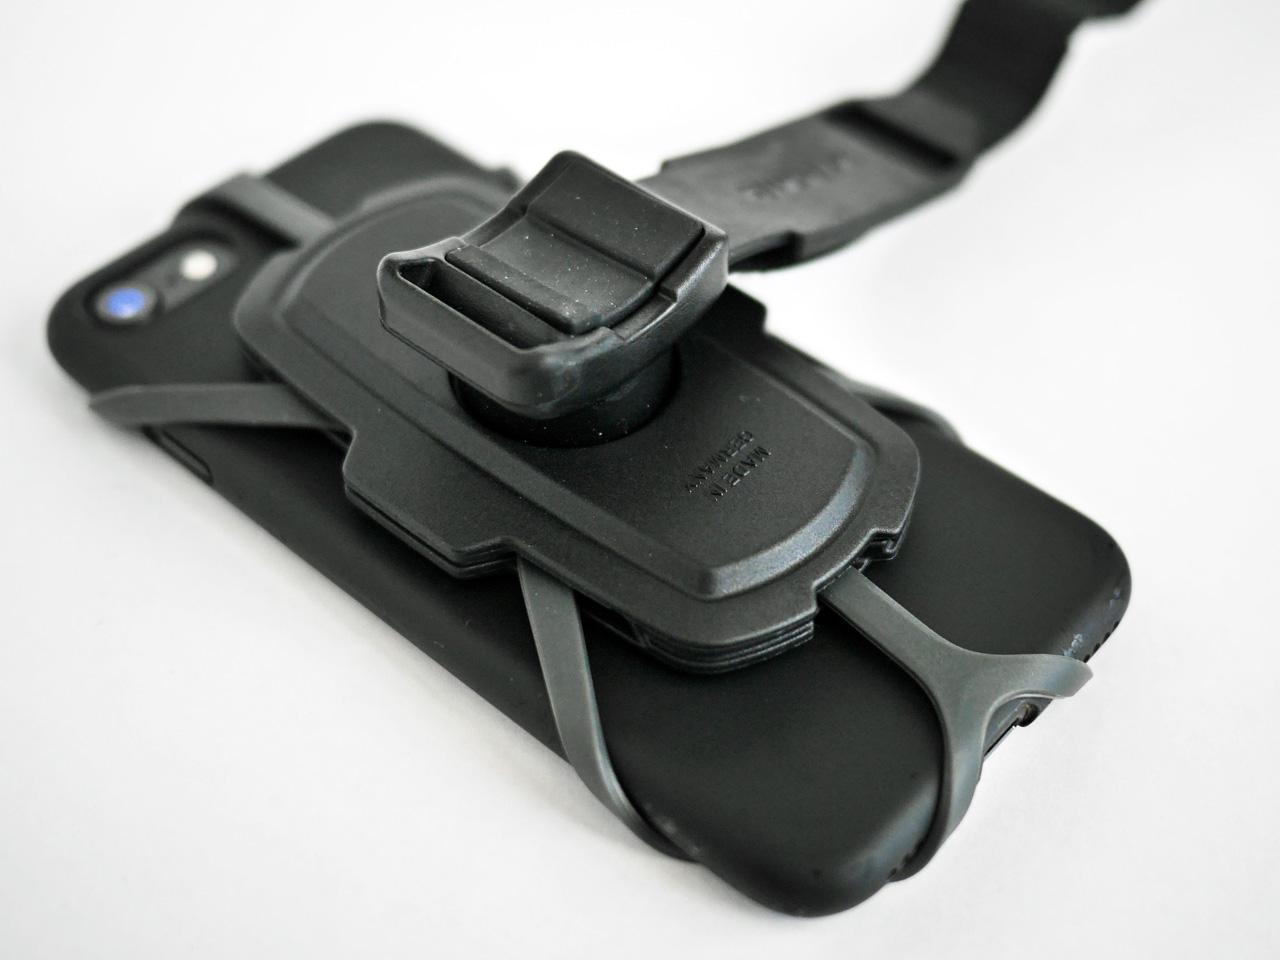 RIXEN&KAUL KAUL PHONEPAD LOOP に iPhone SE2 を装着